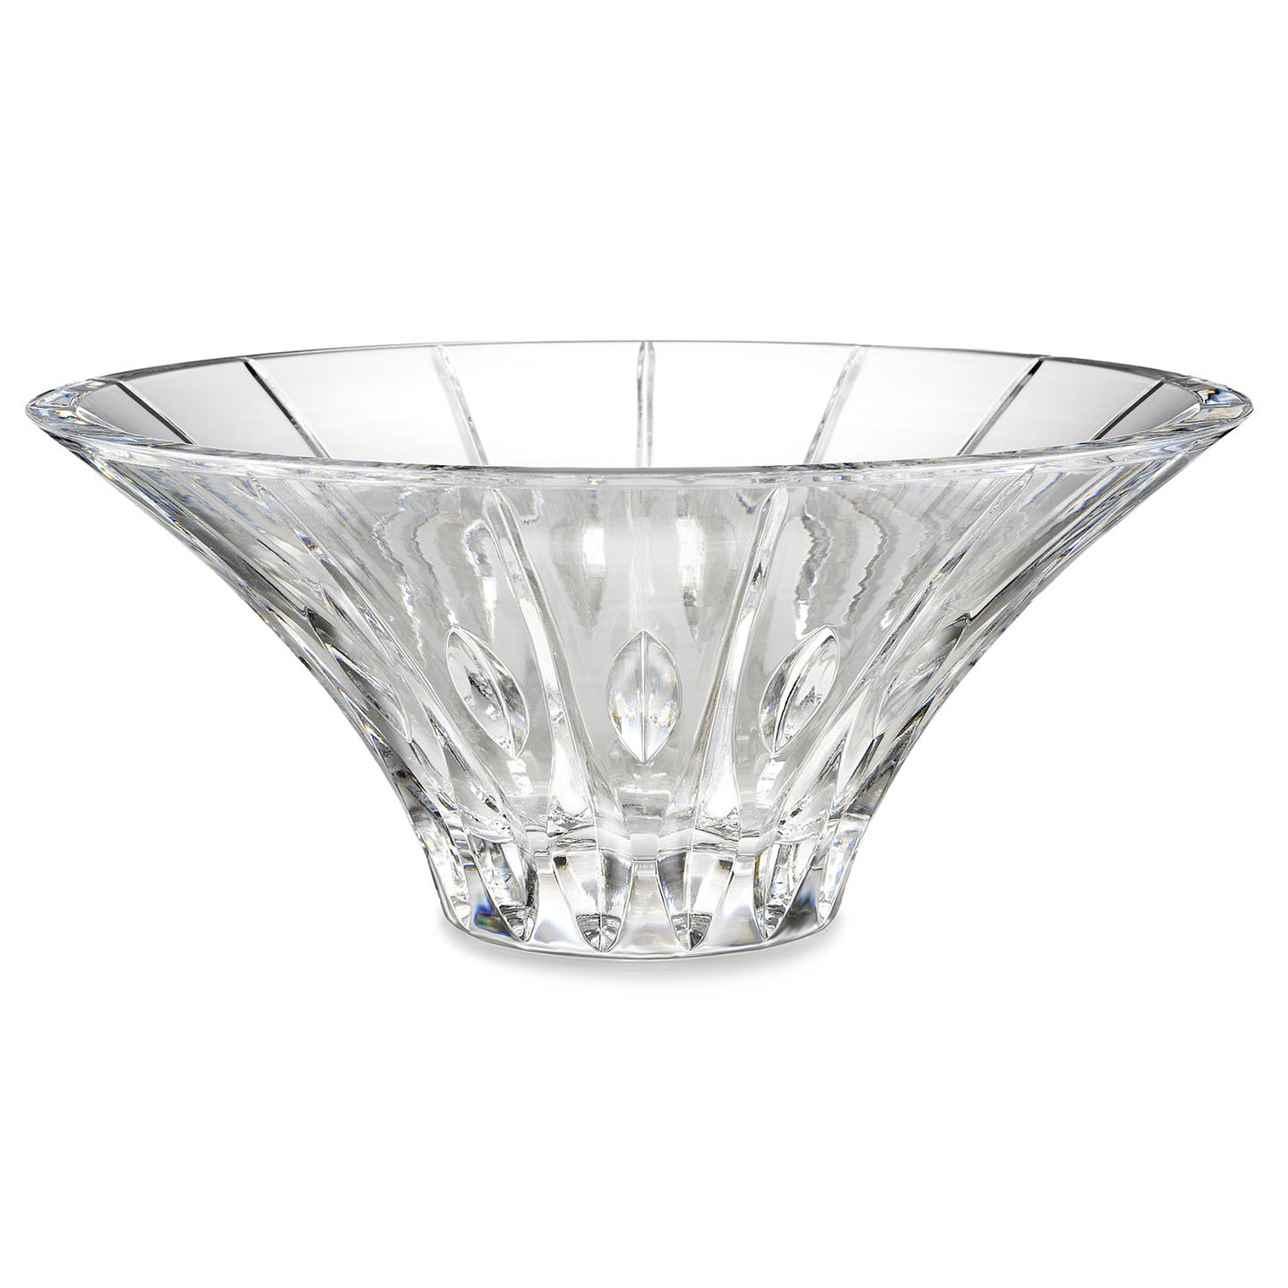 Marquis Sheridan 25cm Flared Bowl